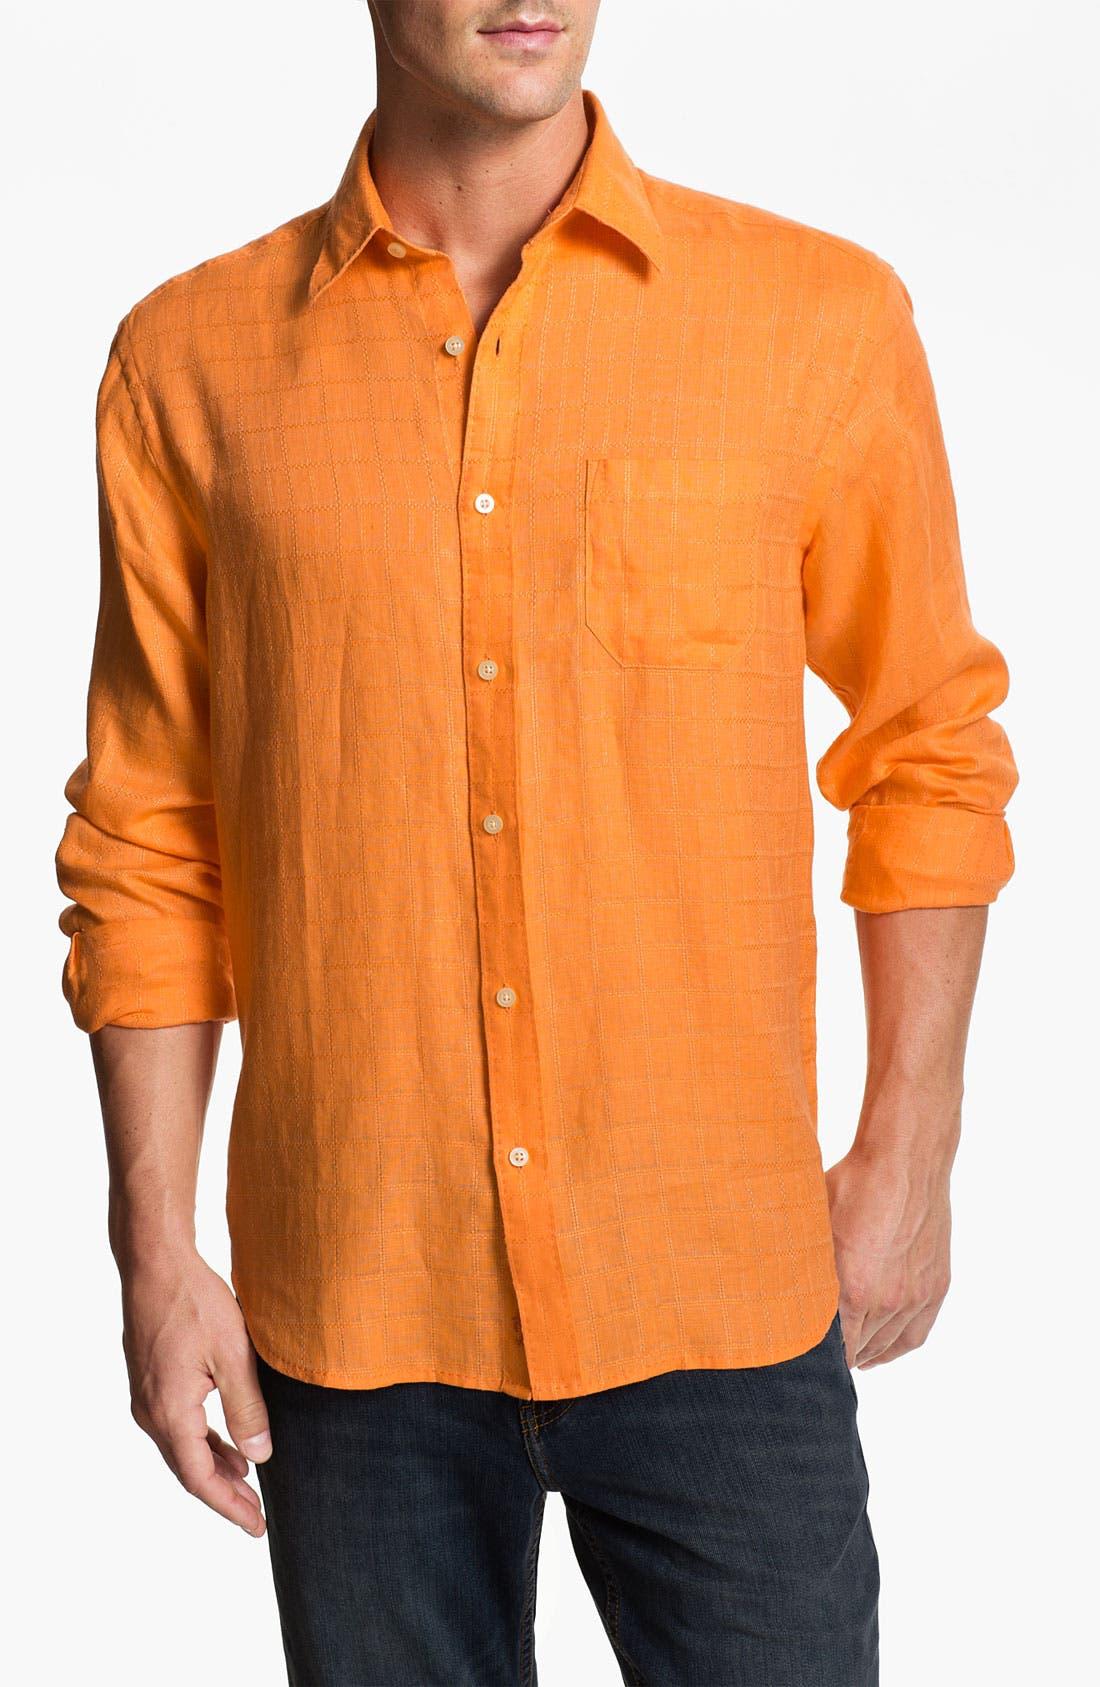 Alternate Image 1 Selected - Tommy Bahama 'Costa Sera' Linen Sport Shirt